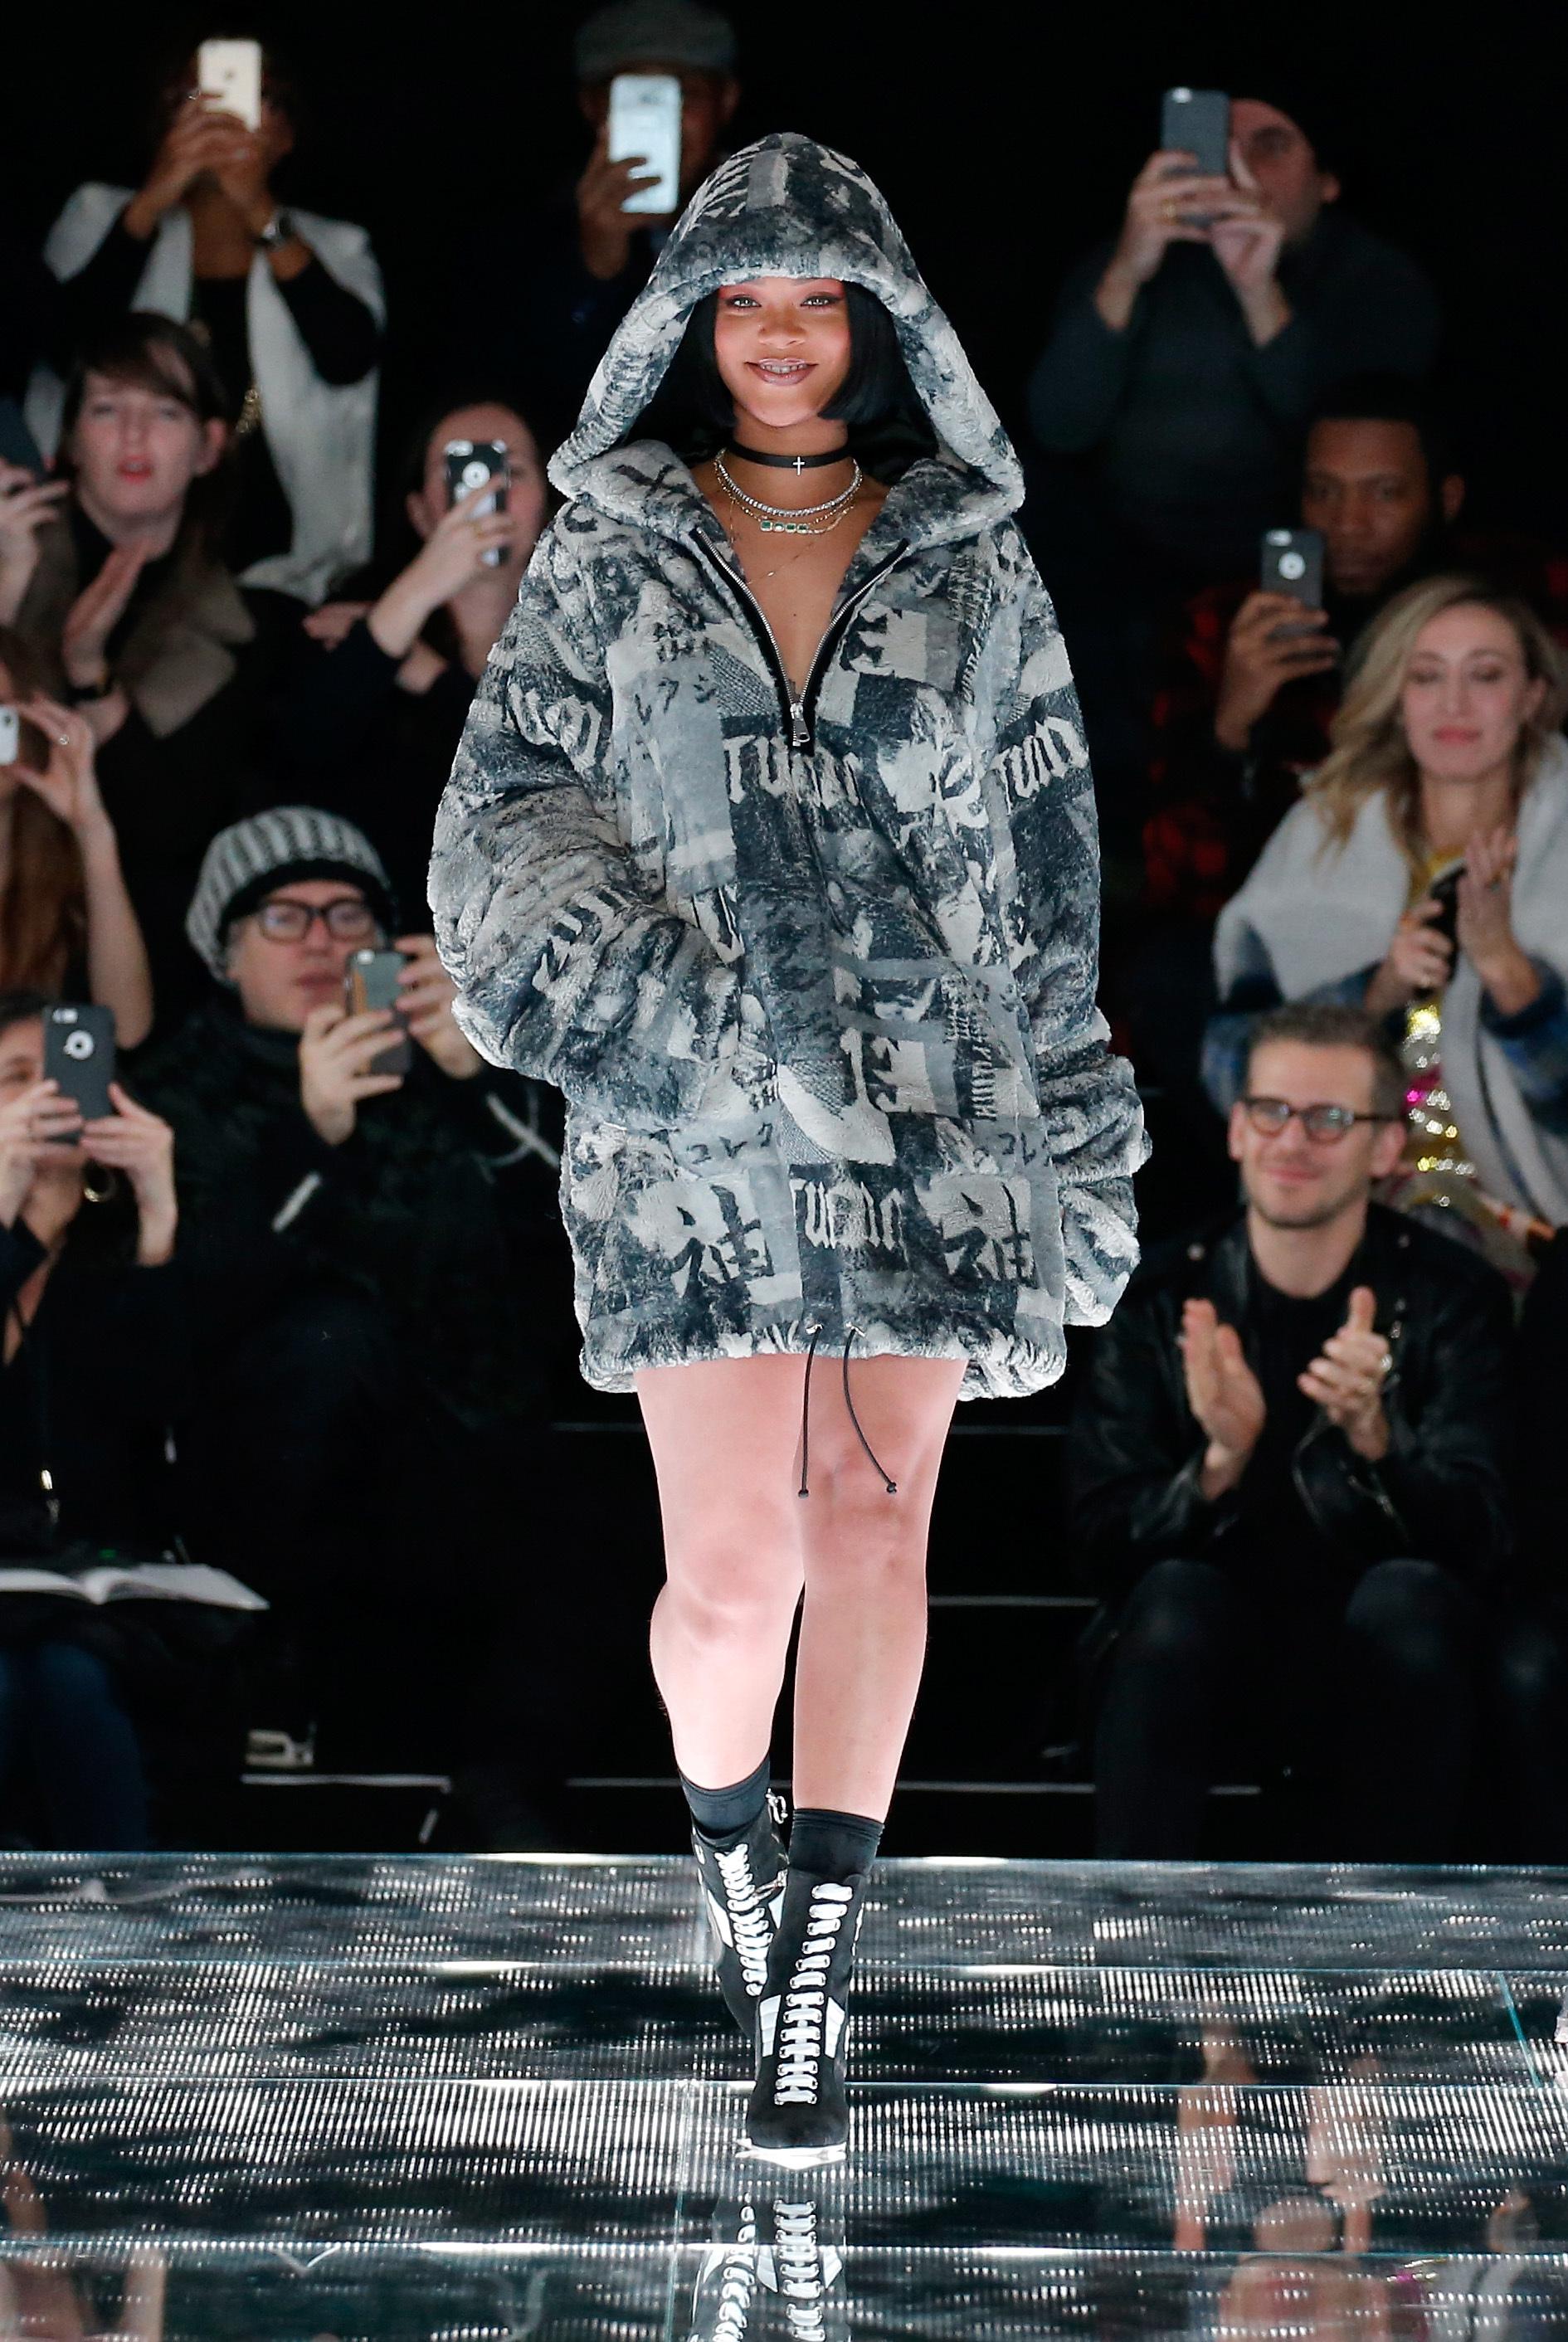 fc1b7424bac5 PUMA by Rihanna AW16 Collection Premieres at New York Fashion Week ...